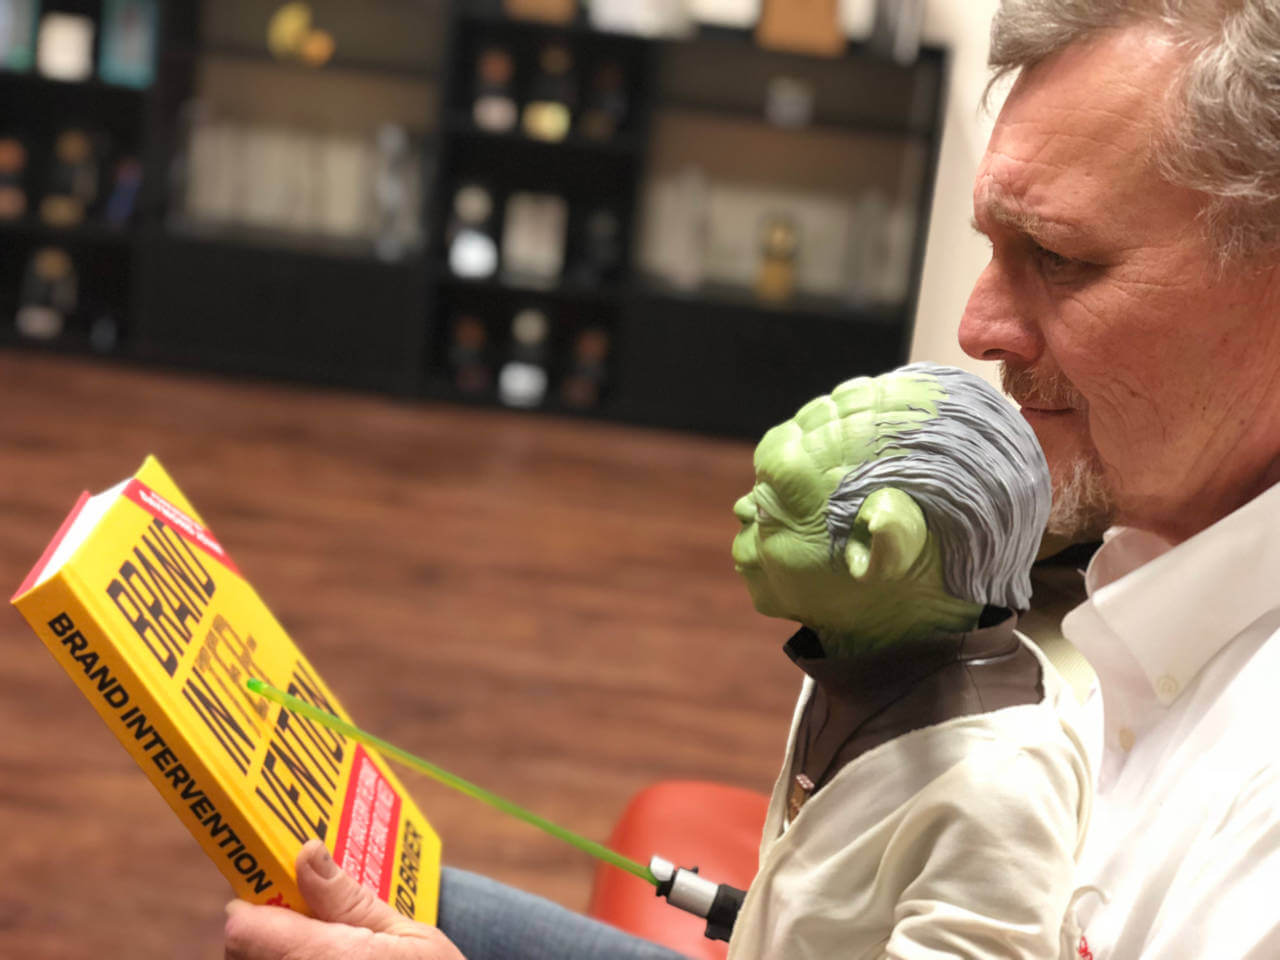 Brand Intervention meets Yoda from Star Wars